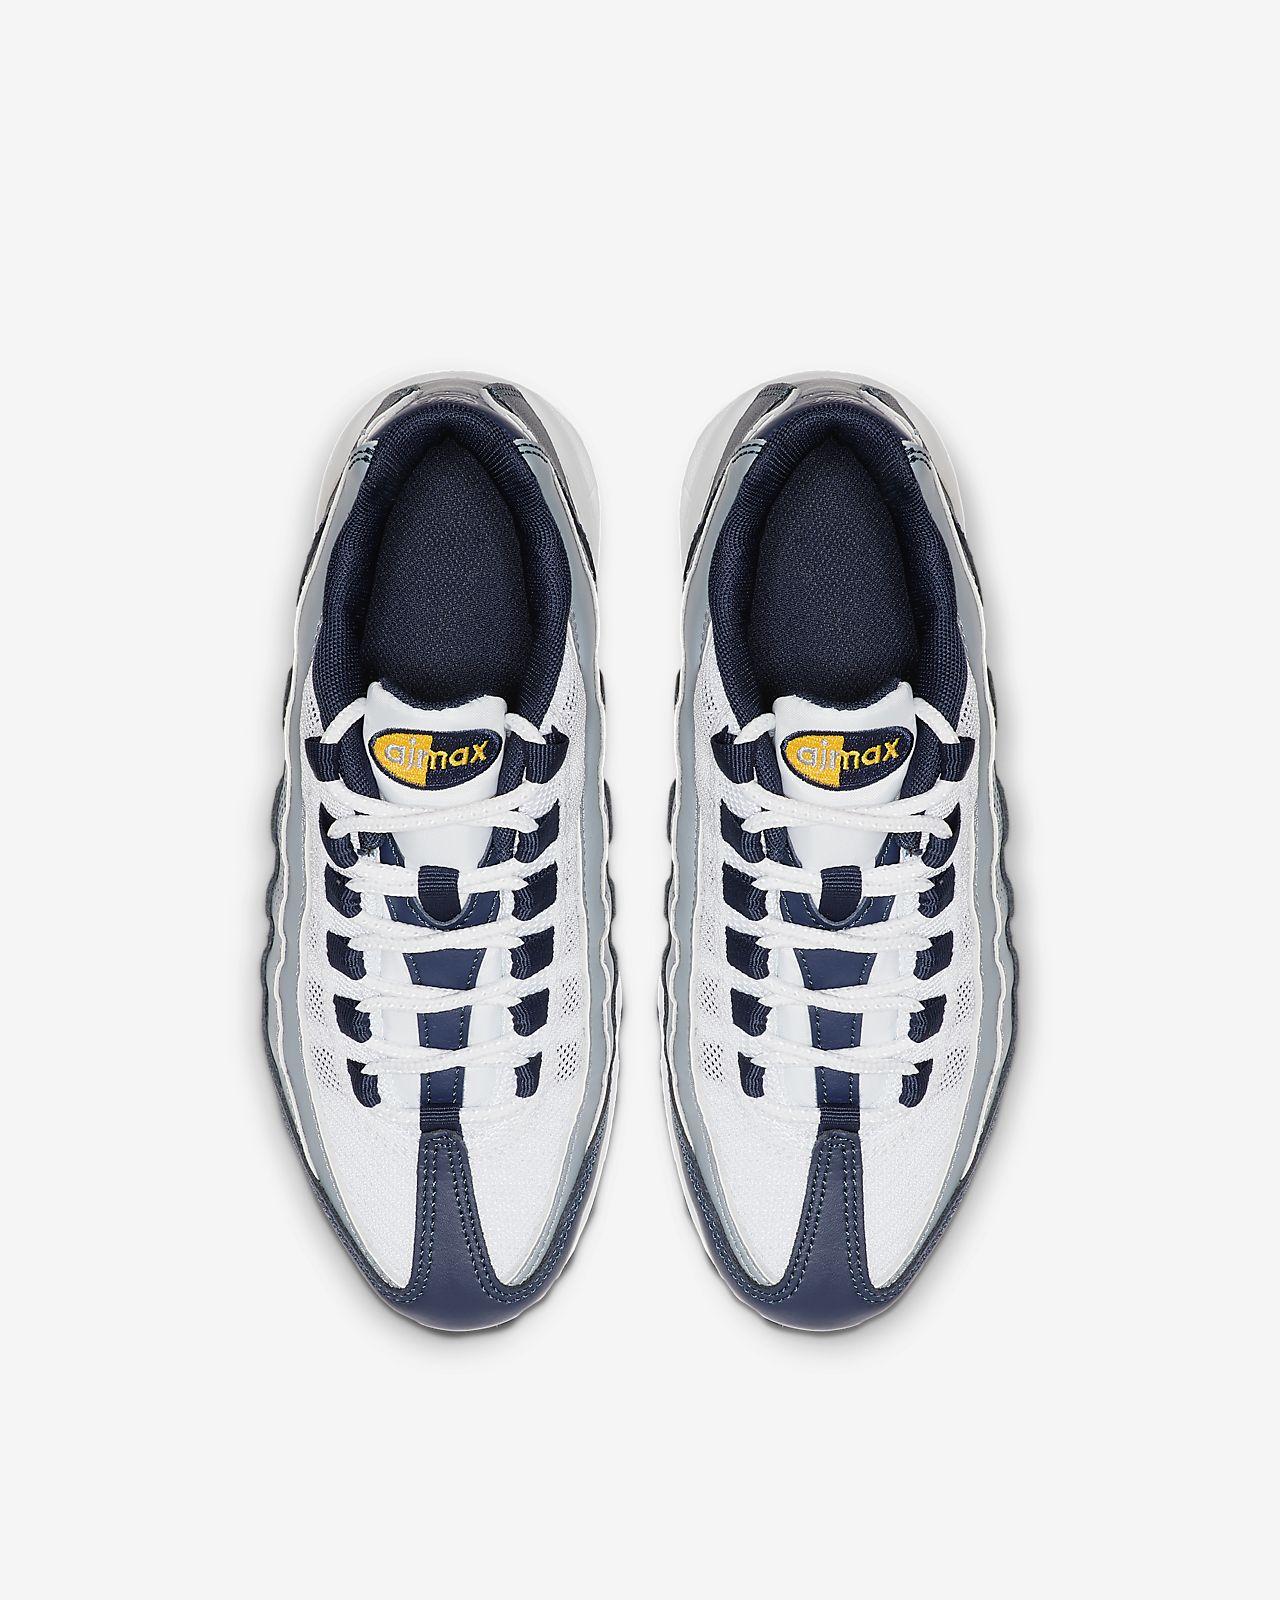 online retailer f7348 572a7 ... Nike Air Max 95 Big Kids  Shoe